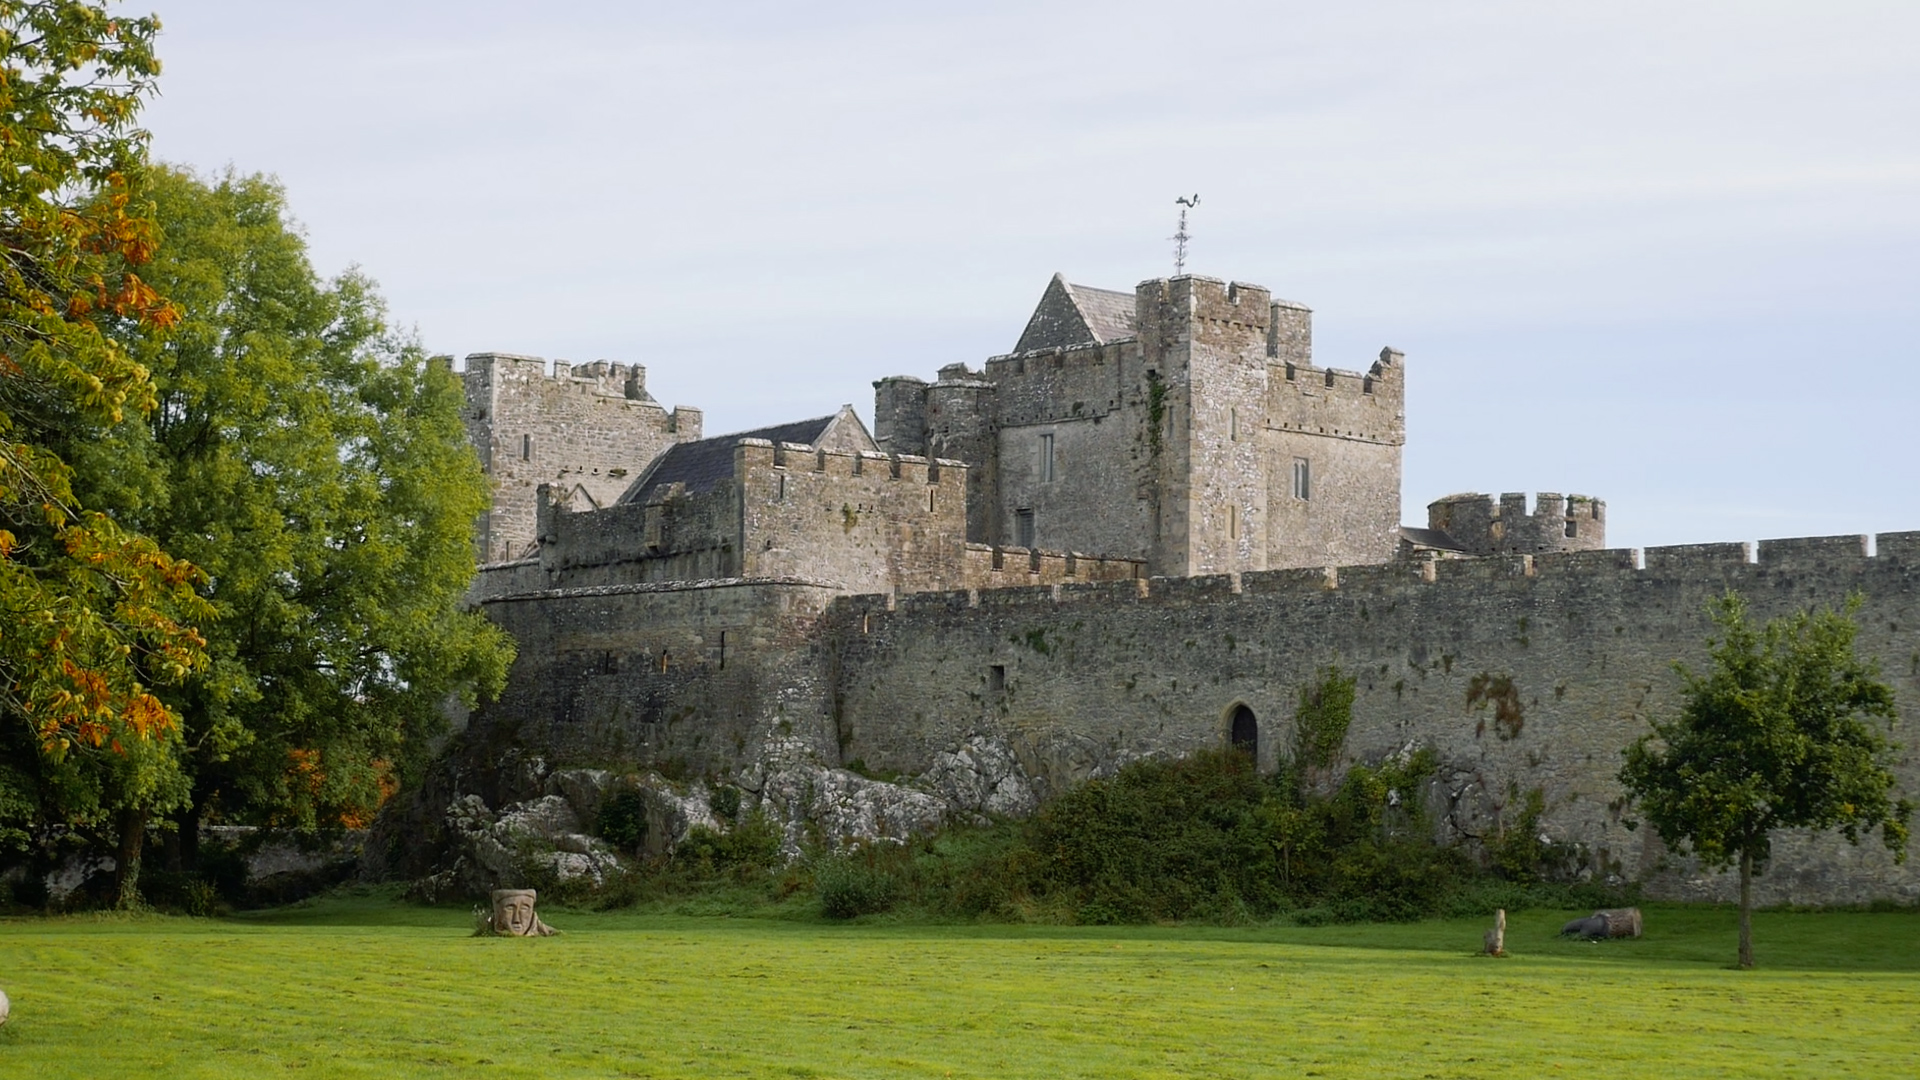 Cahir Castle - Cahir, Co. Tipperary